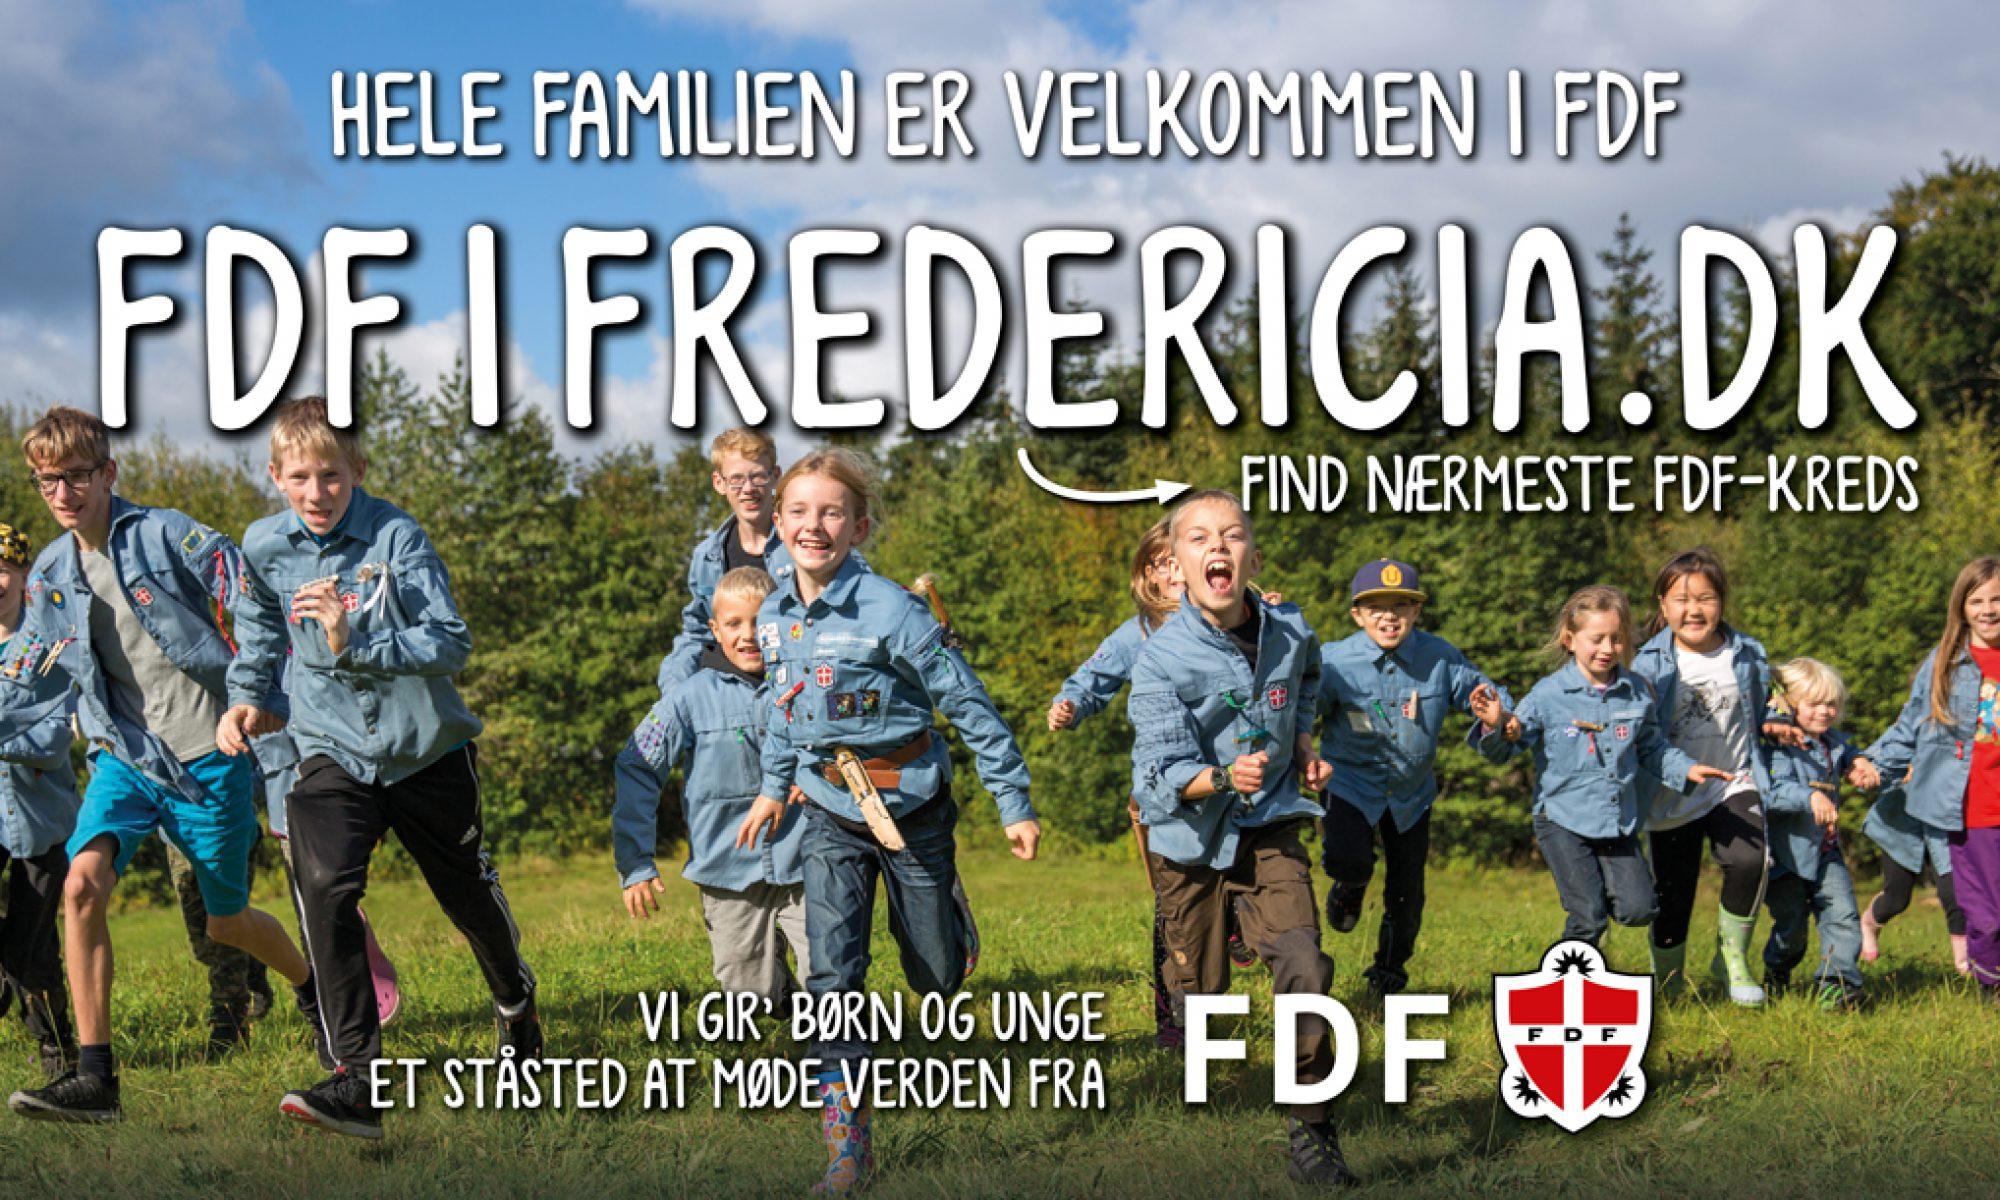 FDF i Fredericia